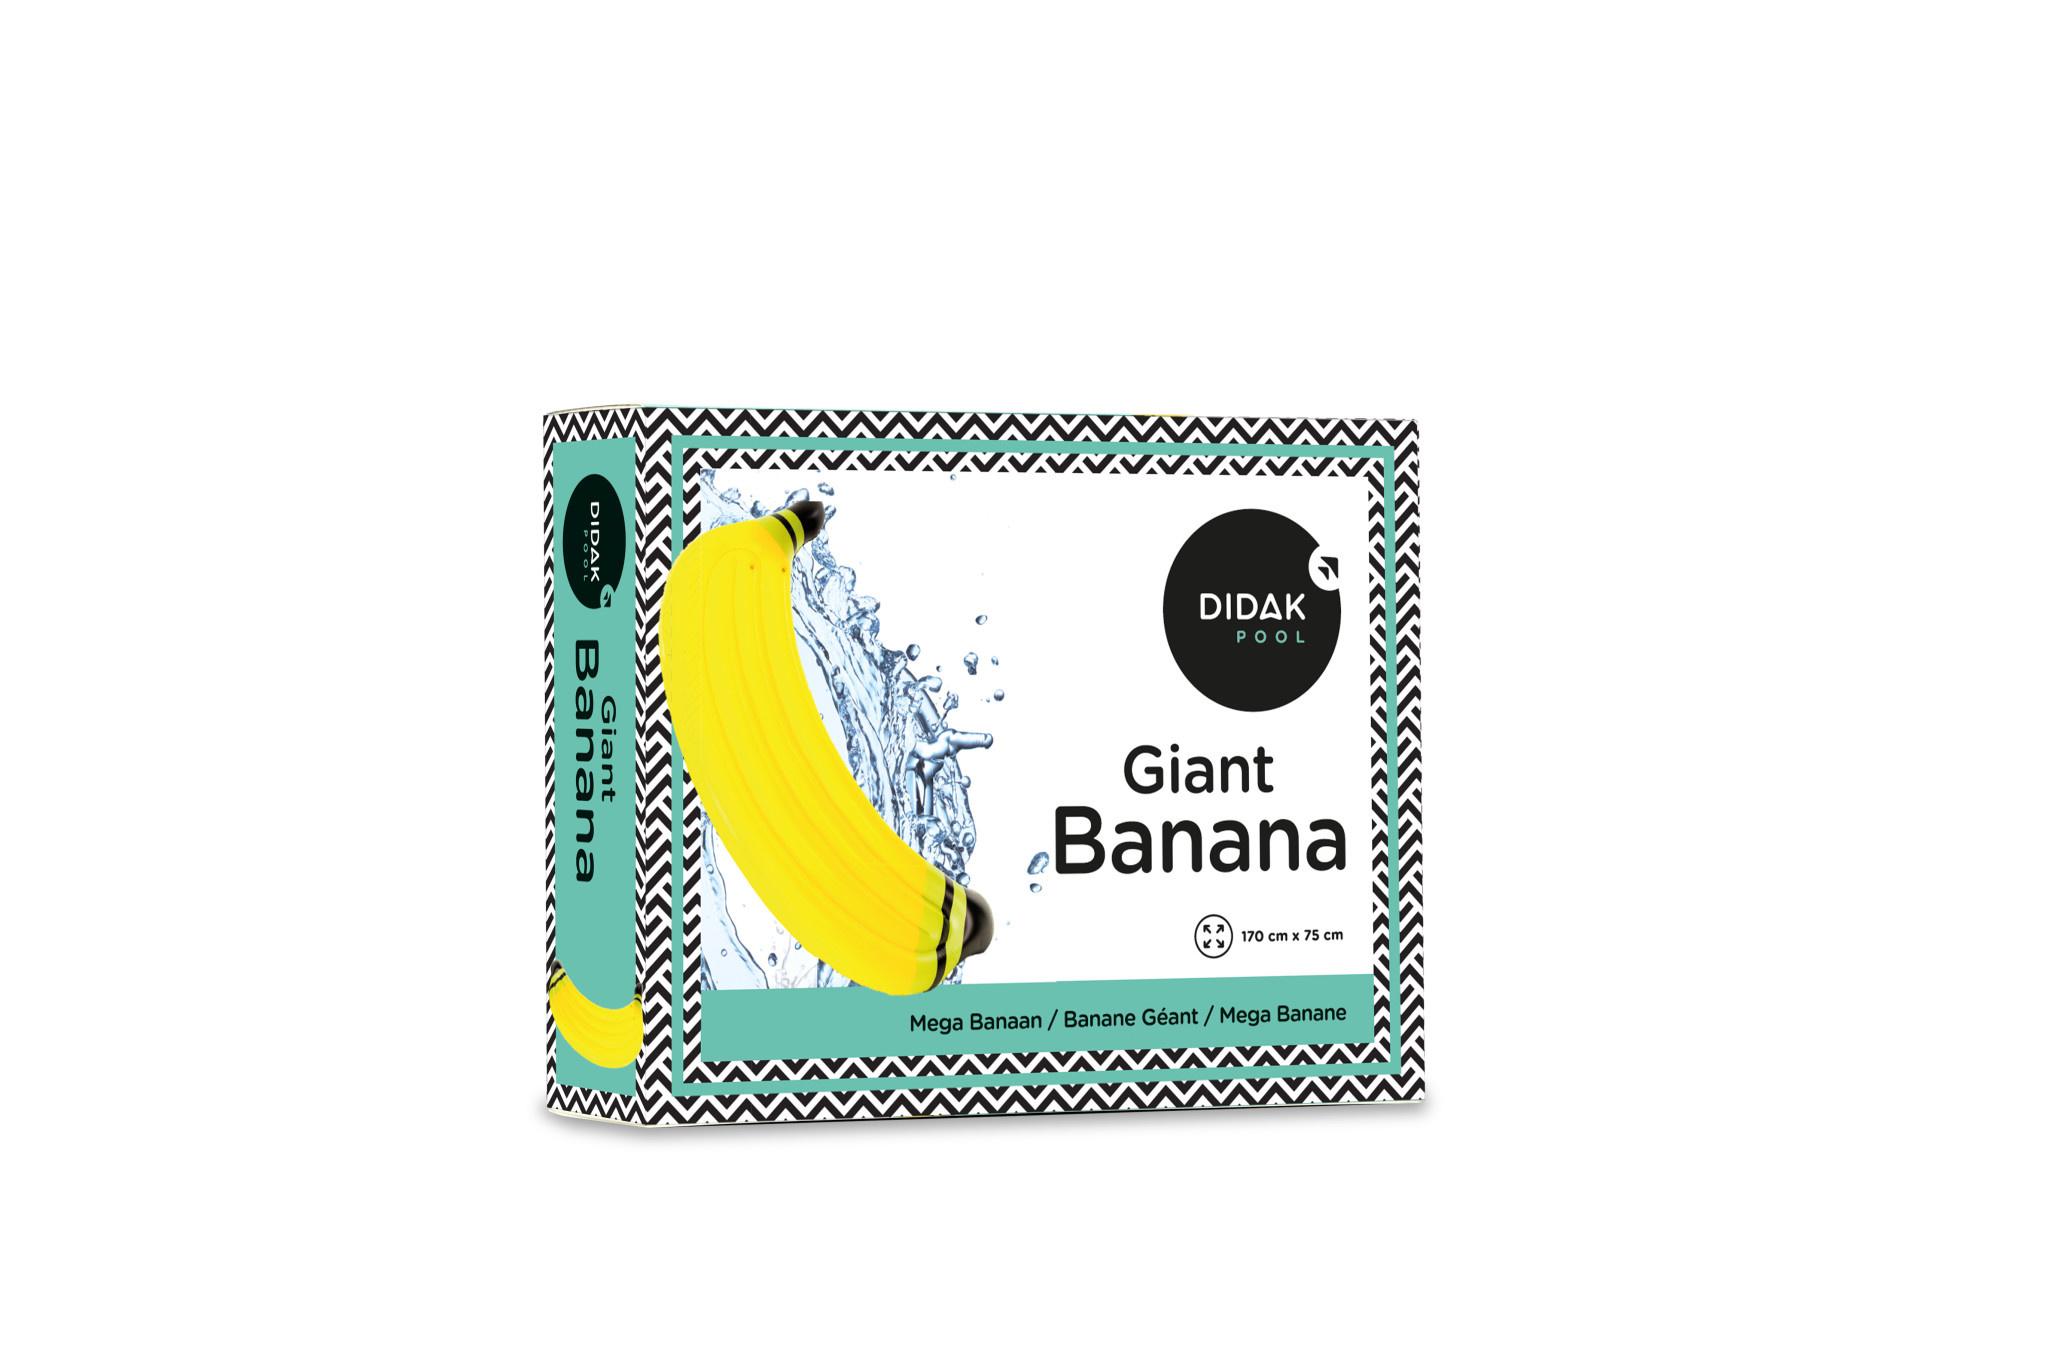 DIDAK Giant Banana Float  - 170x75cm